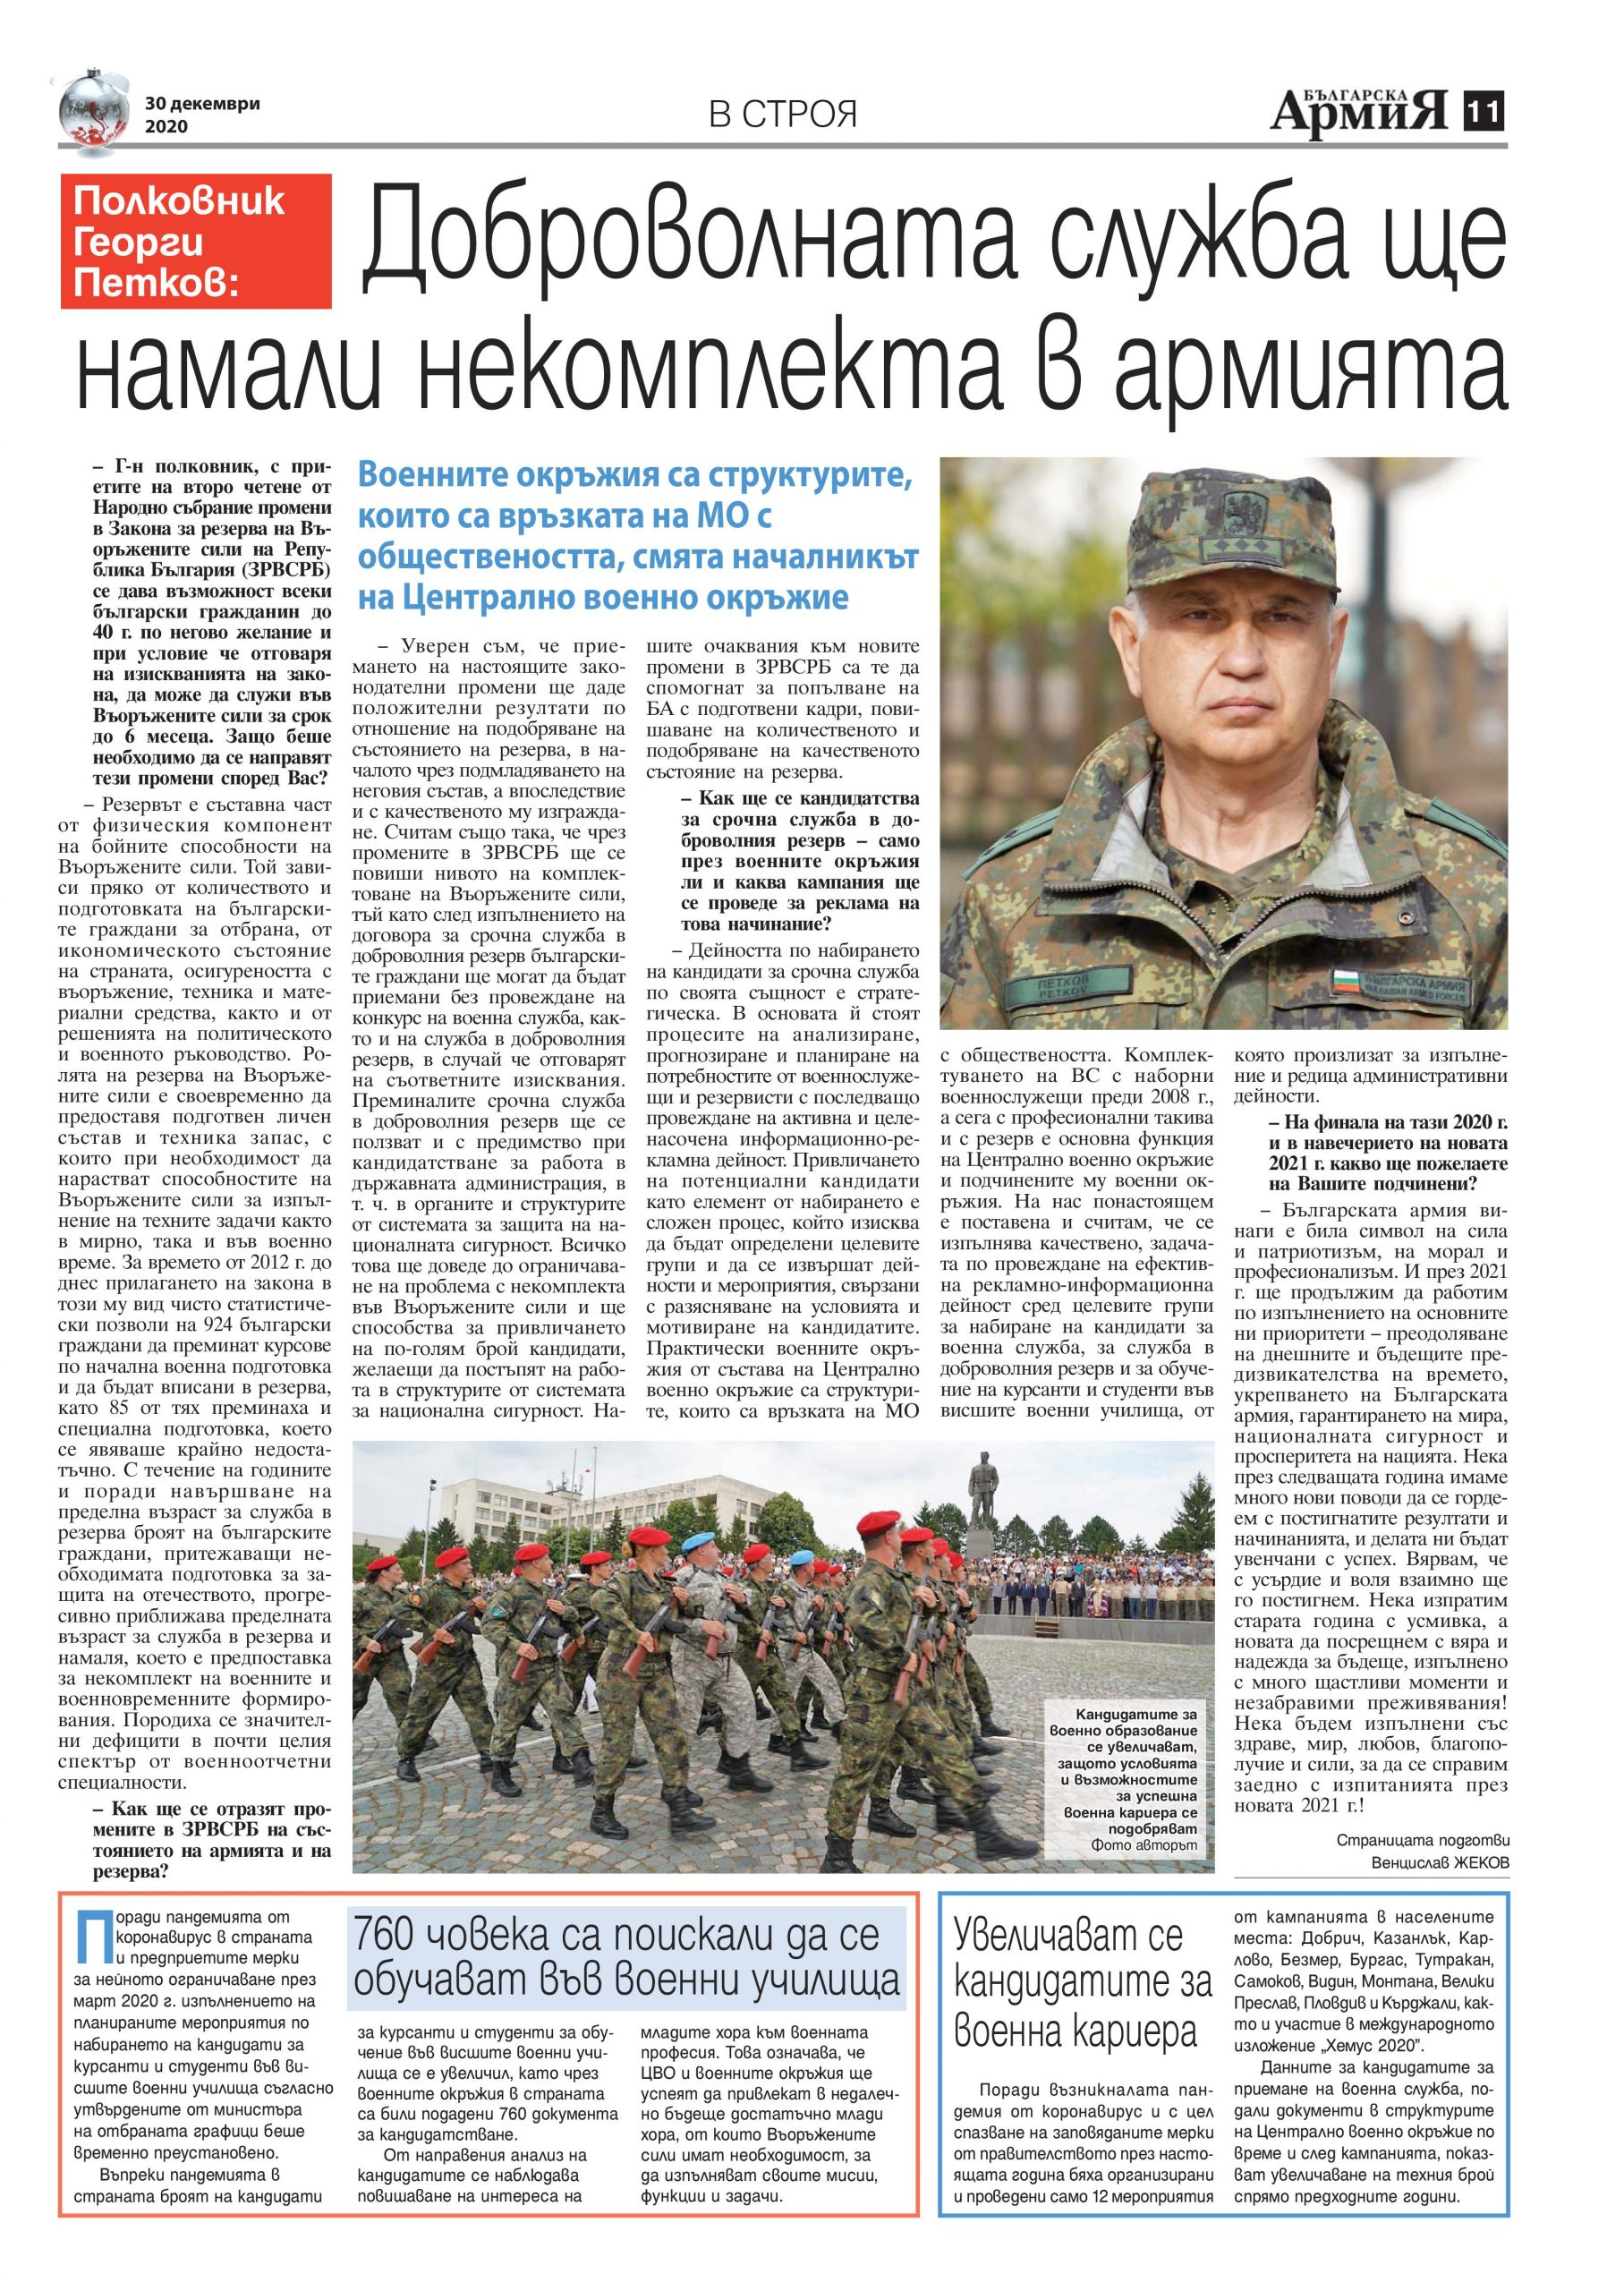 https://armymedia.bg/wp-content/uploads/2015/06/11-54-scaled.jpg